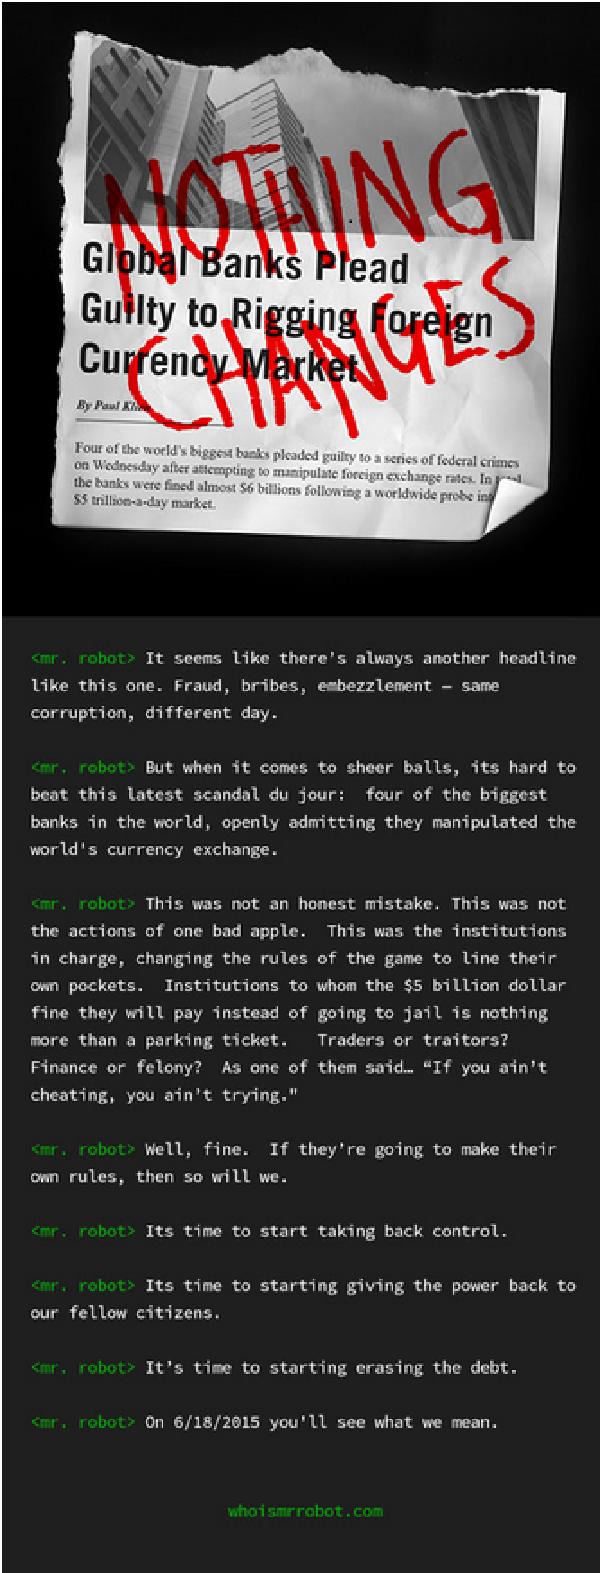 mr-robot-mail-body